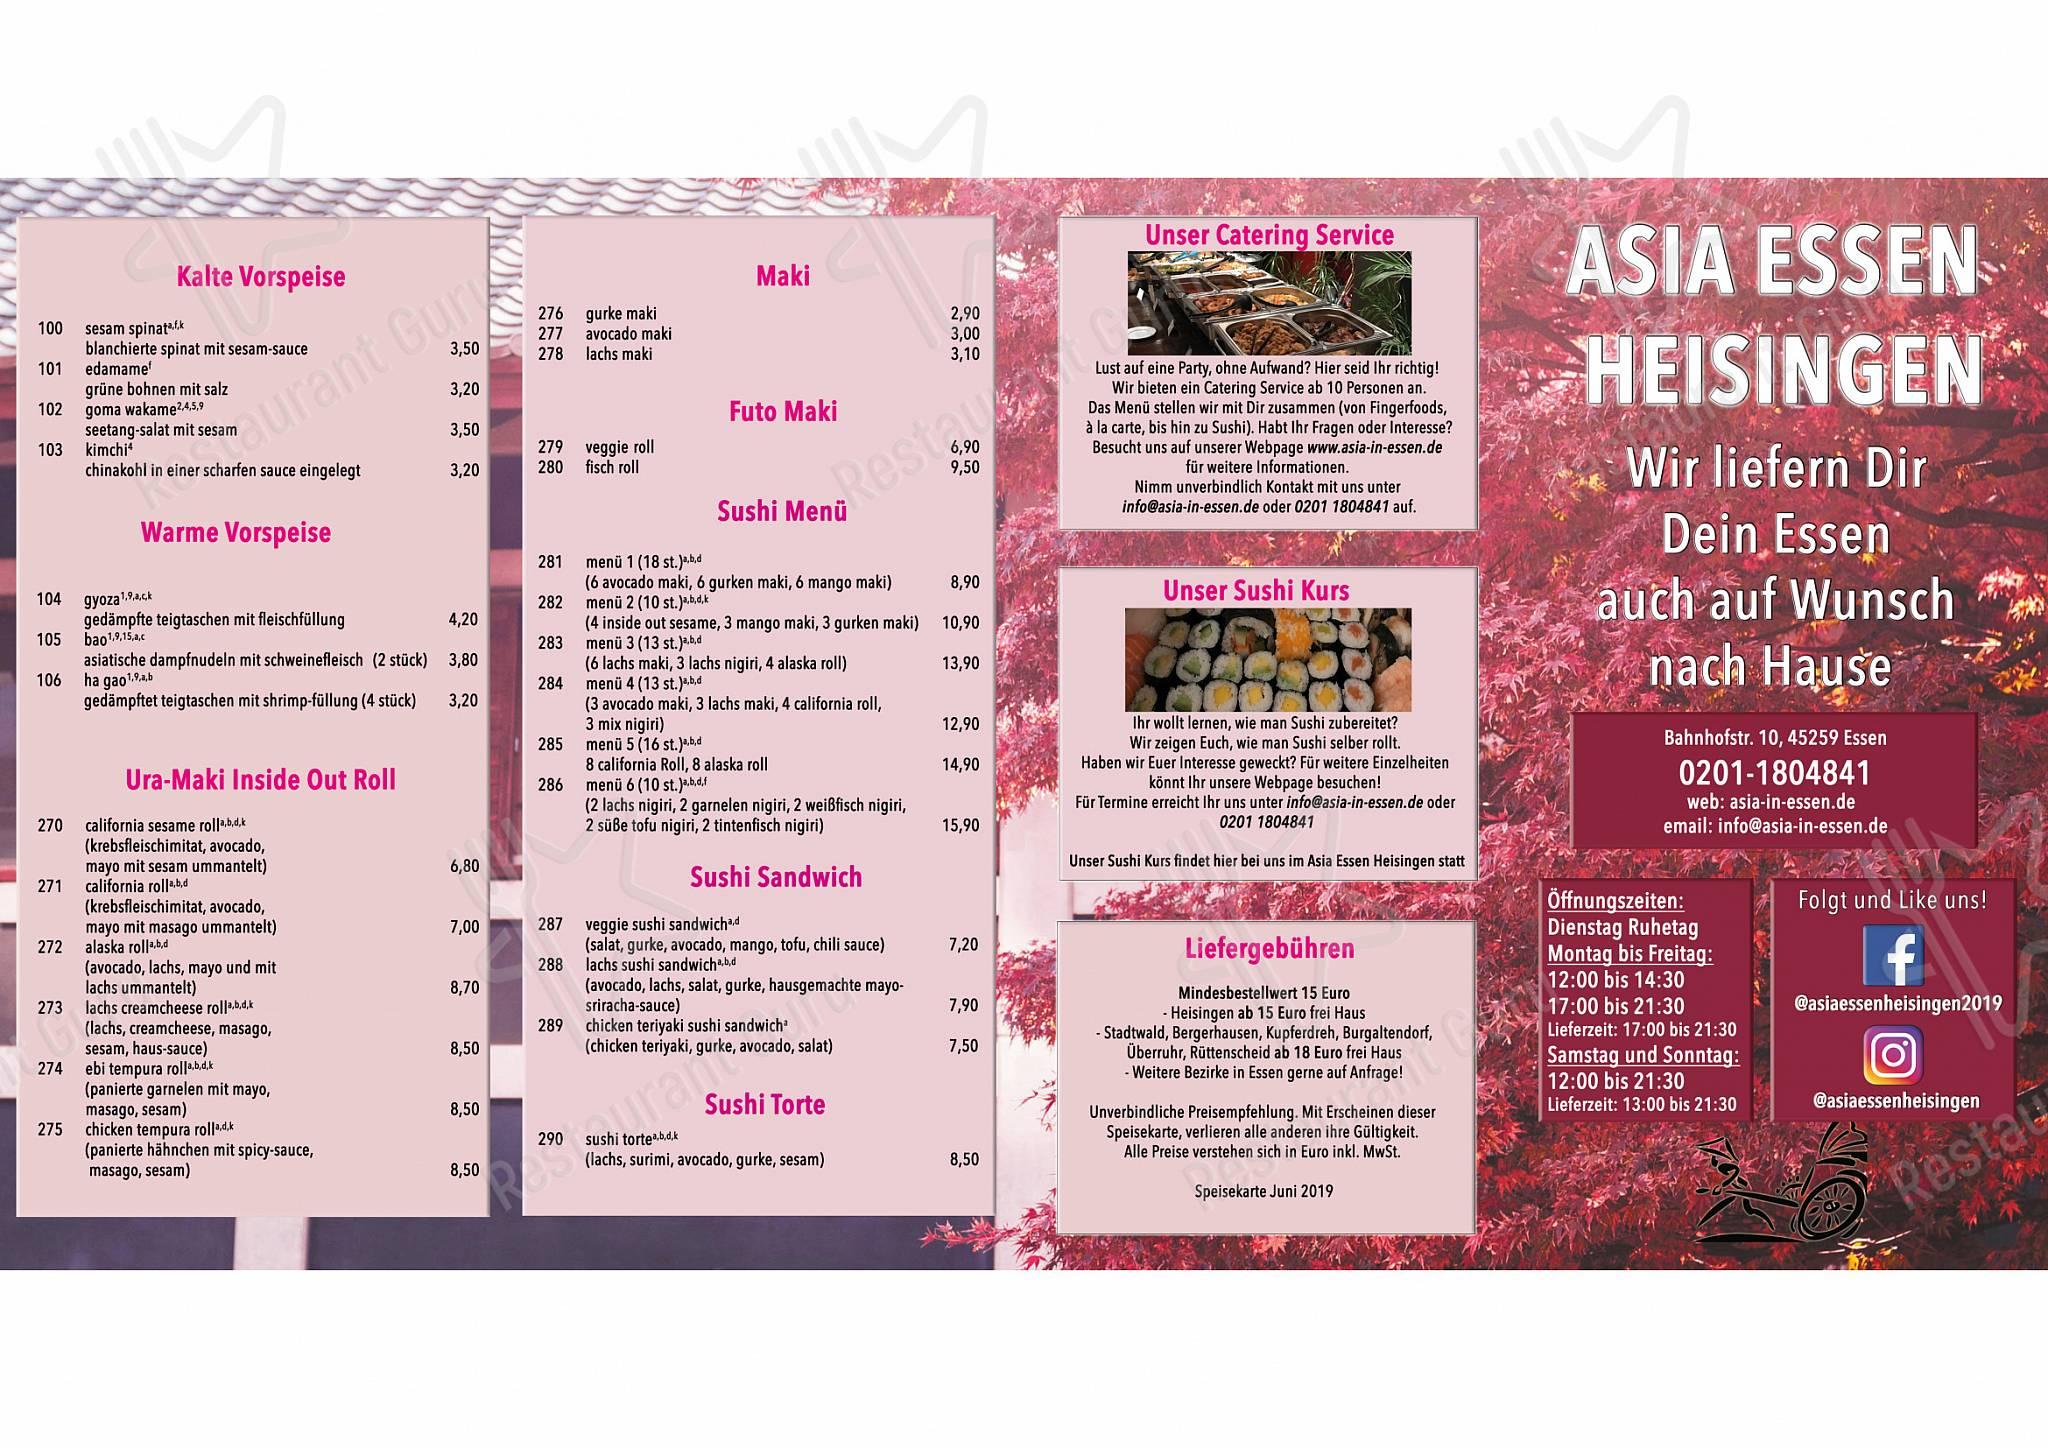 Menu for the Asia Essen Heisingen restaurant